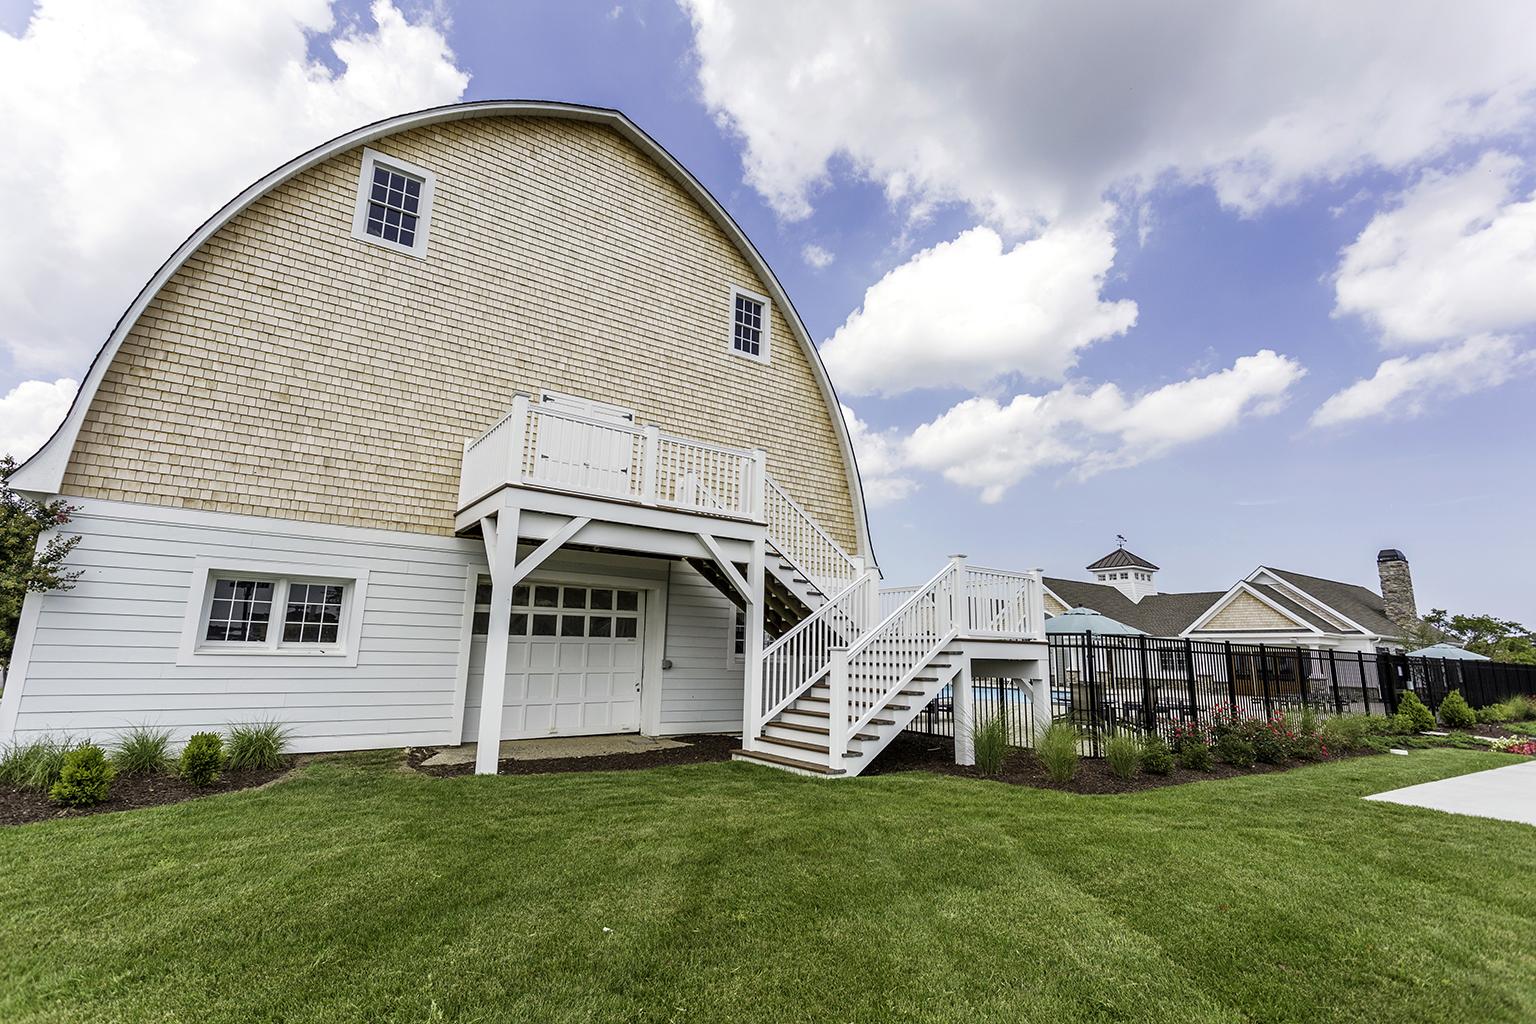 Showfield_barn-front-closer.jpg